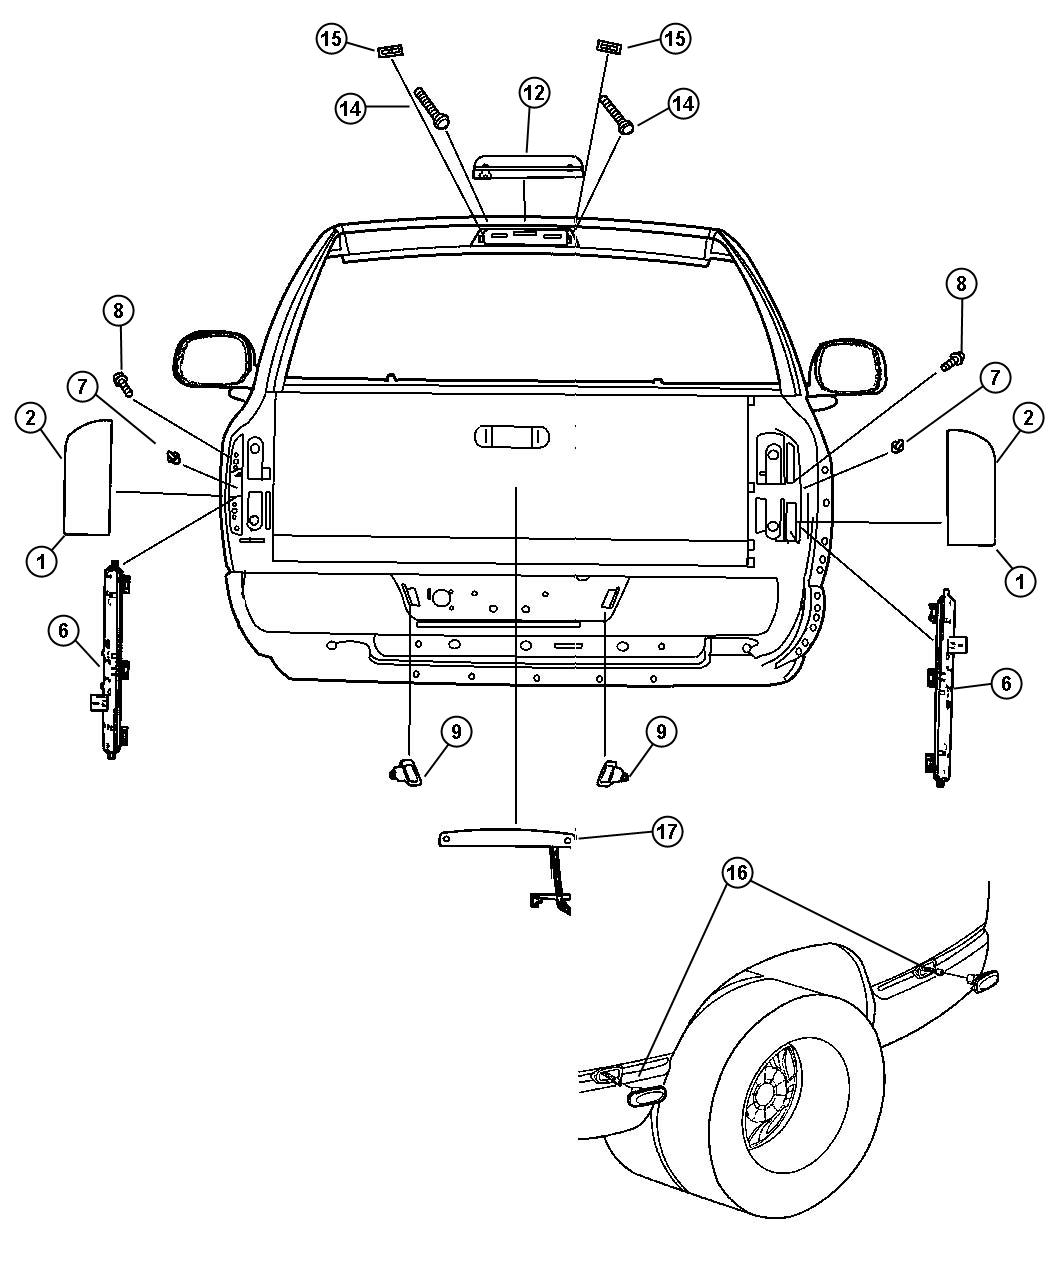 2007 dodge ram 2500 wiring diagram together with 2007 dodge ram 1500